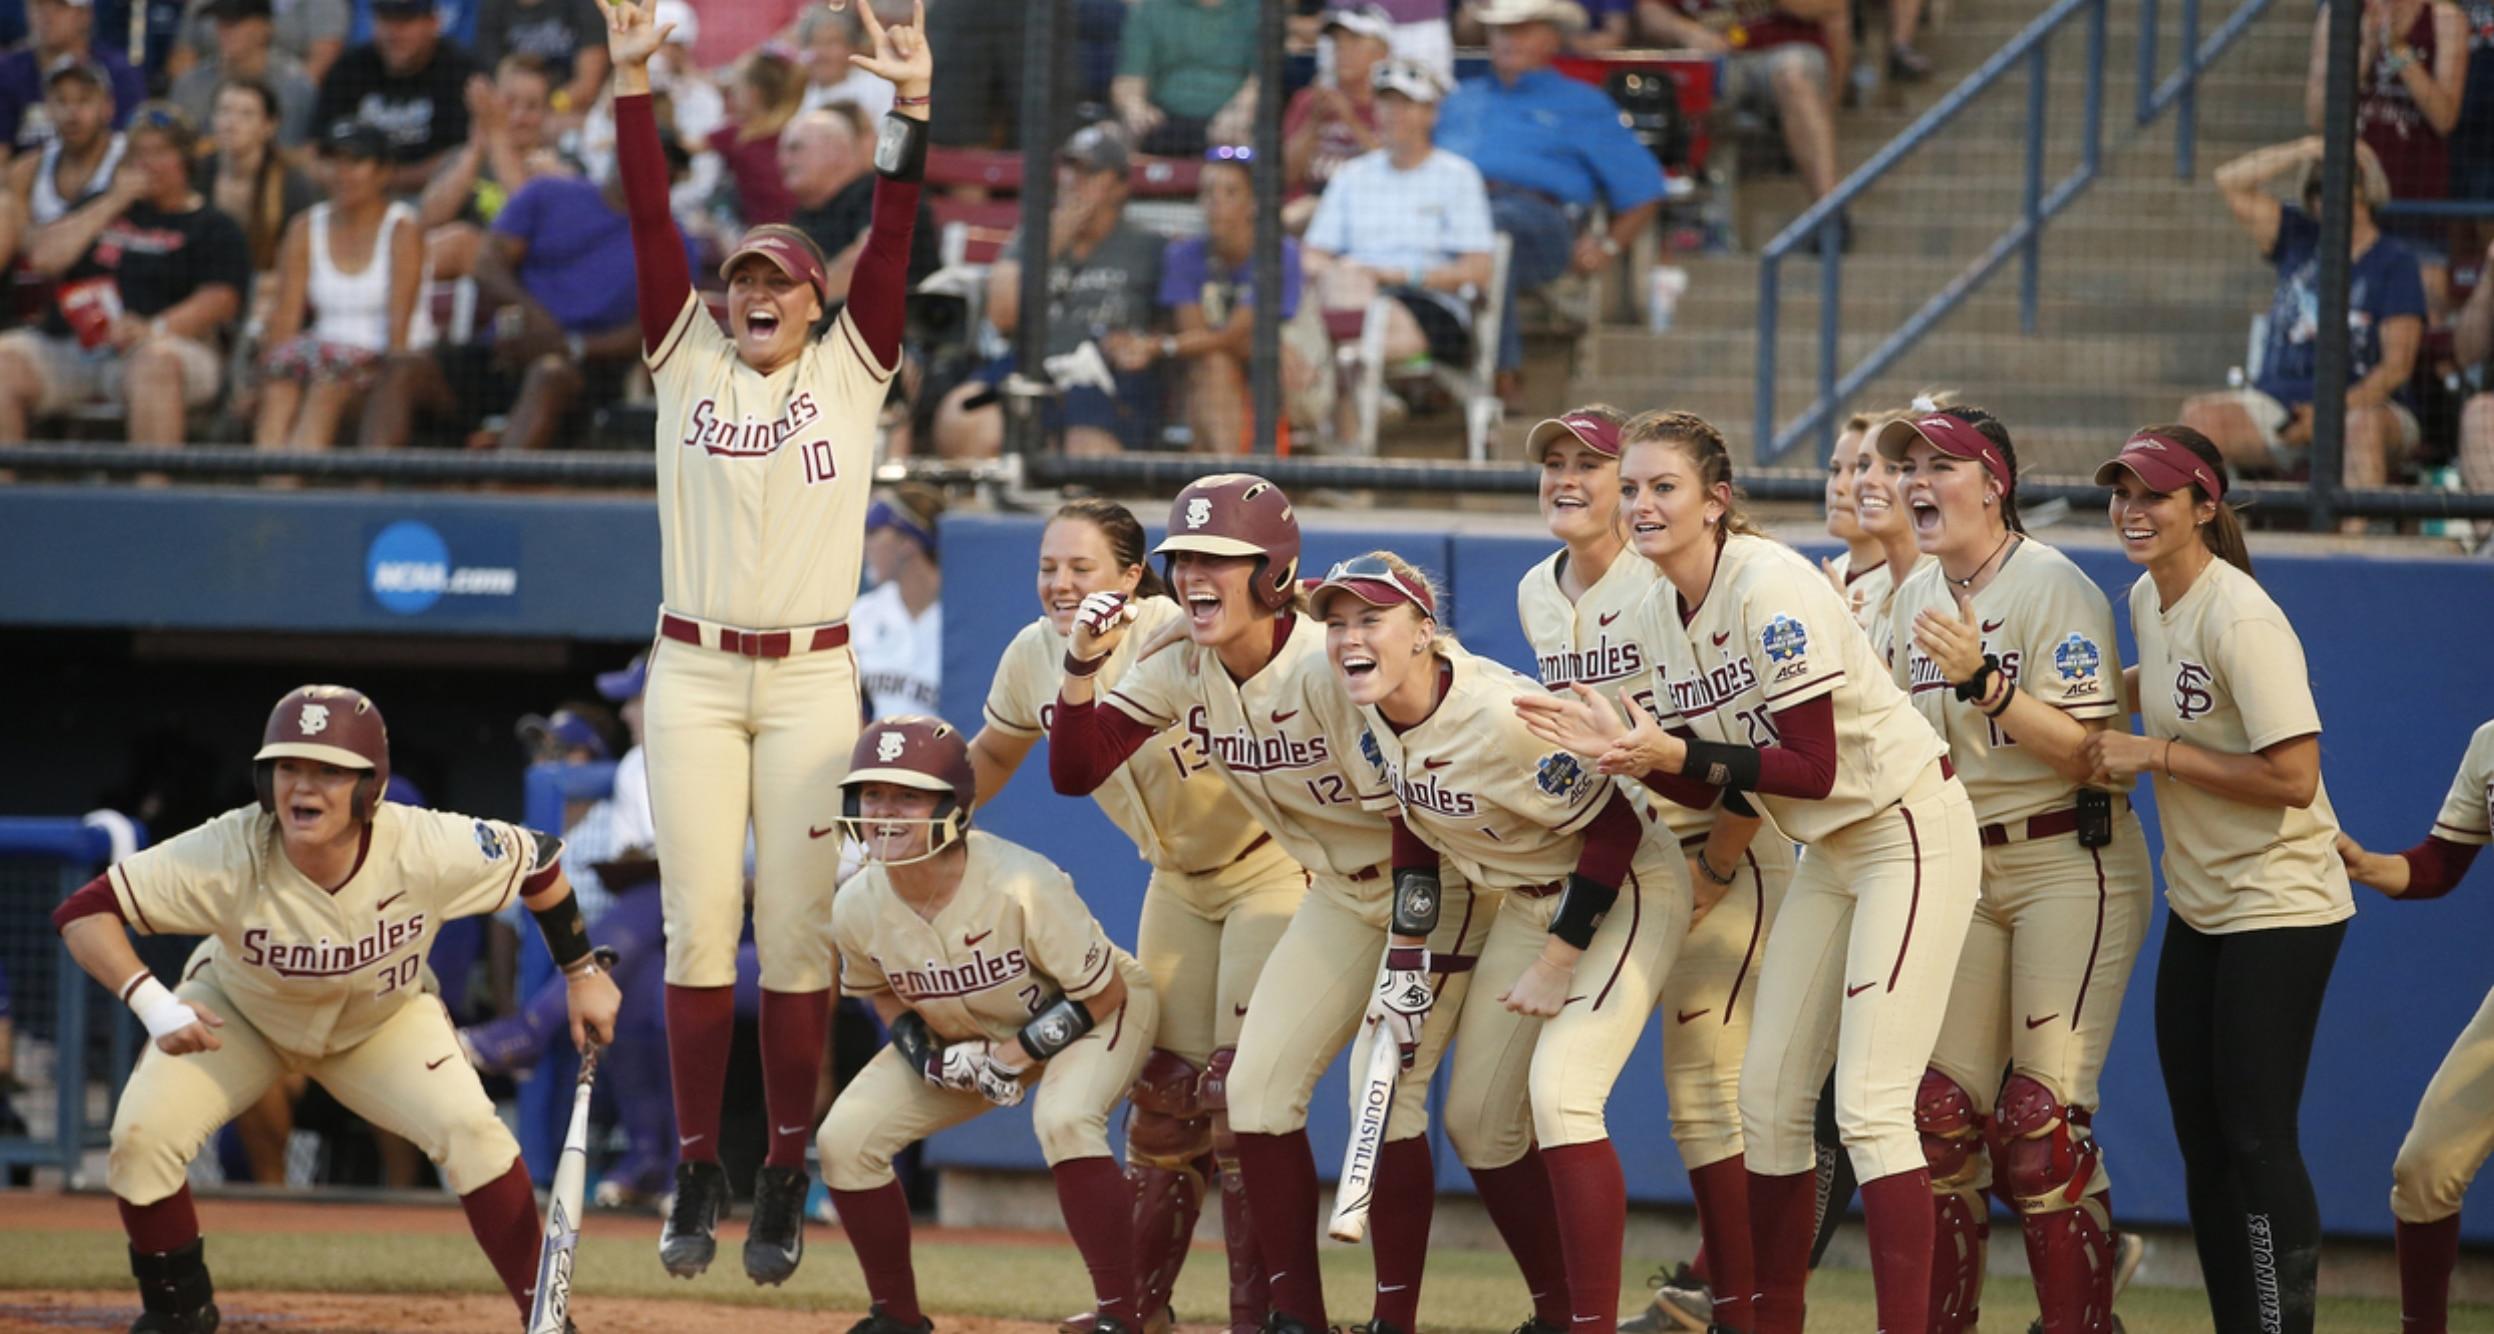 DI Softball Women's College World Series: Florida State's 8 unanswered runs  on Washington help the Noles claim the 2018 Softball Championship